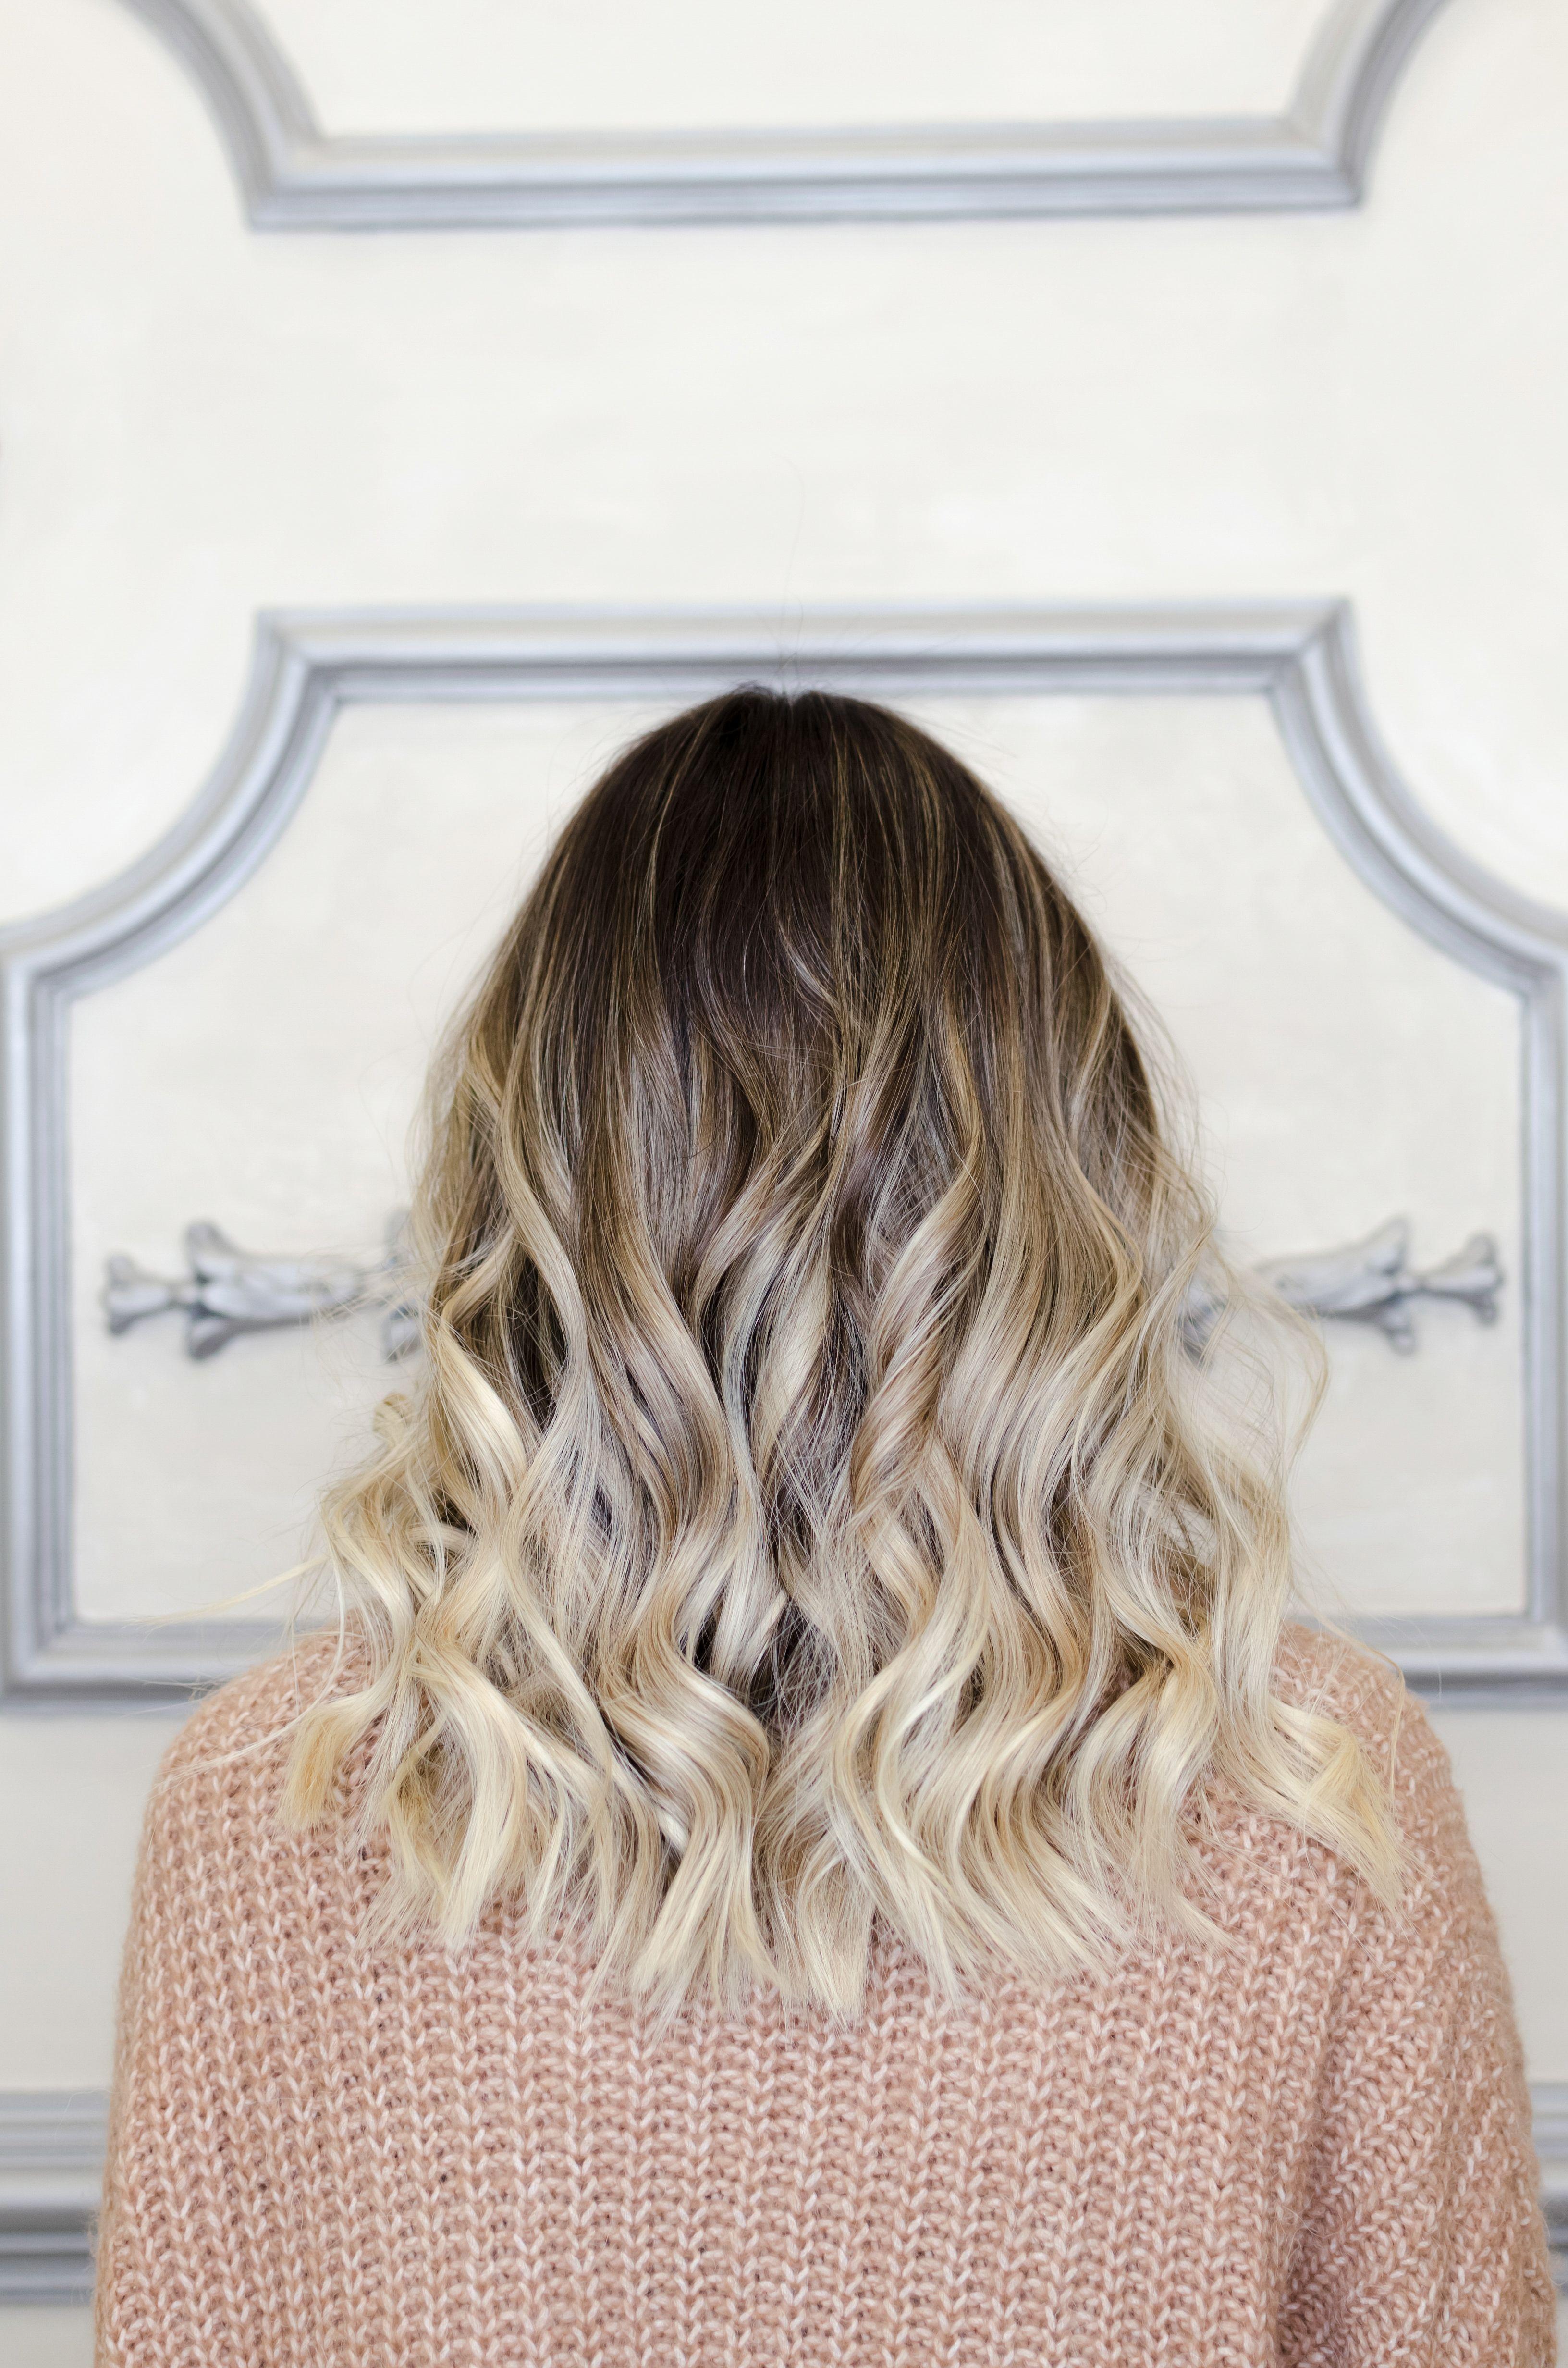 Te Preguntas Cómo Hacer Ondas En El Cabello Con Plancha Exiten Diferentes Tipos De Ondas Como Medium Length Hair Styles Blonde Balayage Balayage Hair Blonde